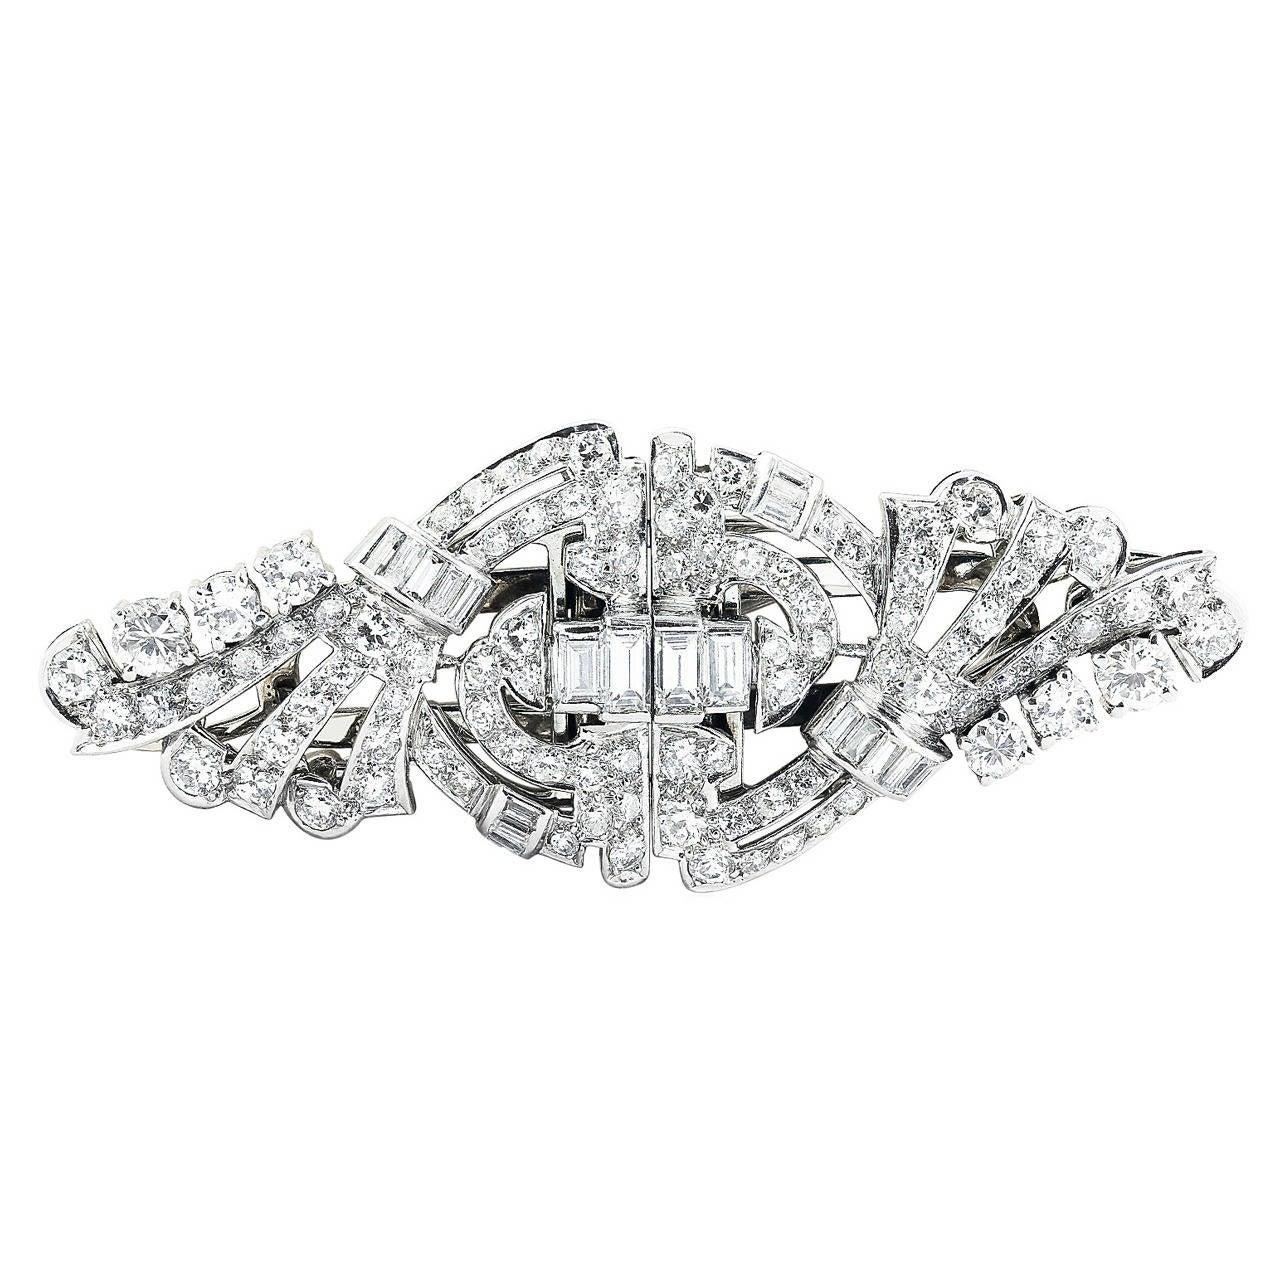 Art Deco 5.50 Carat Diamond Clips and Pin